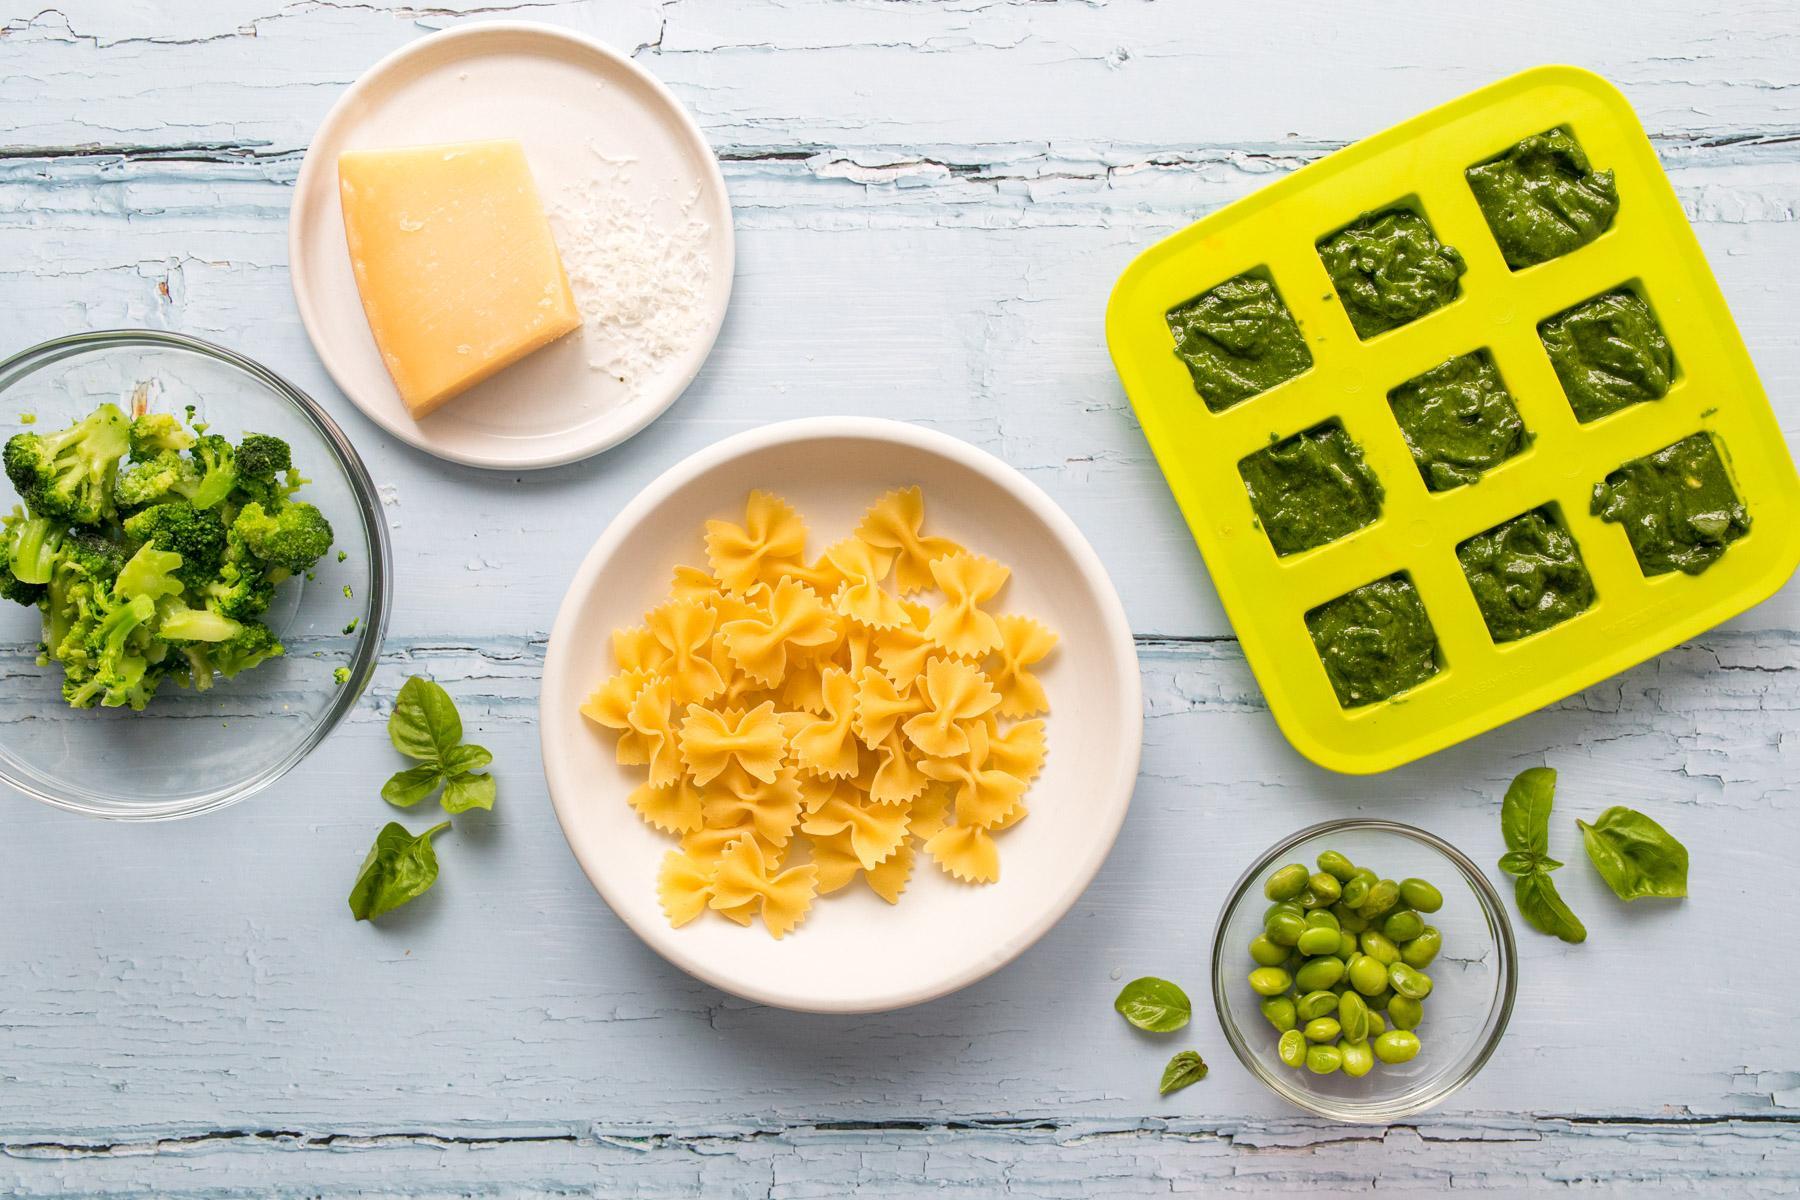 pesto pasta ingredients on a table